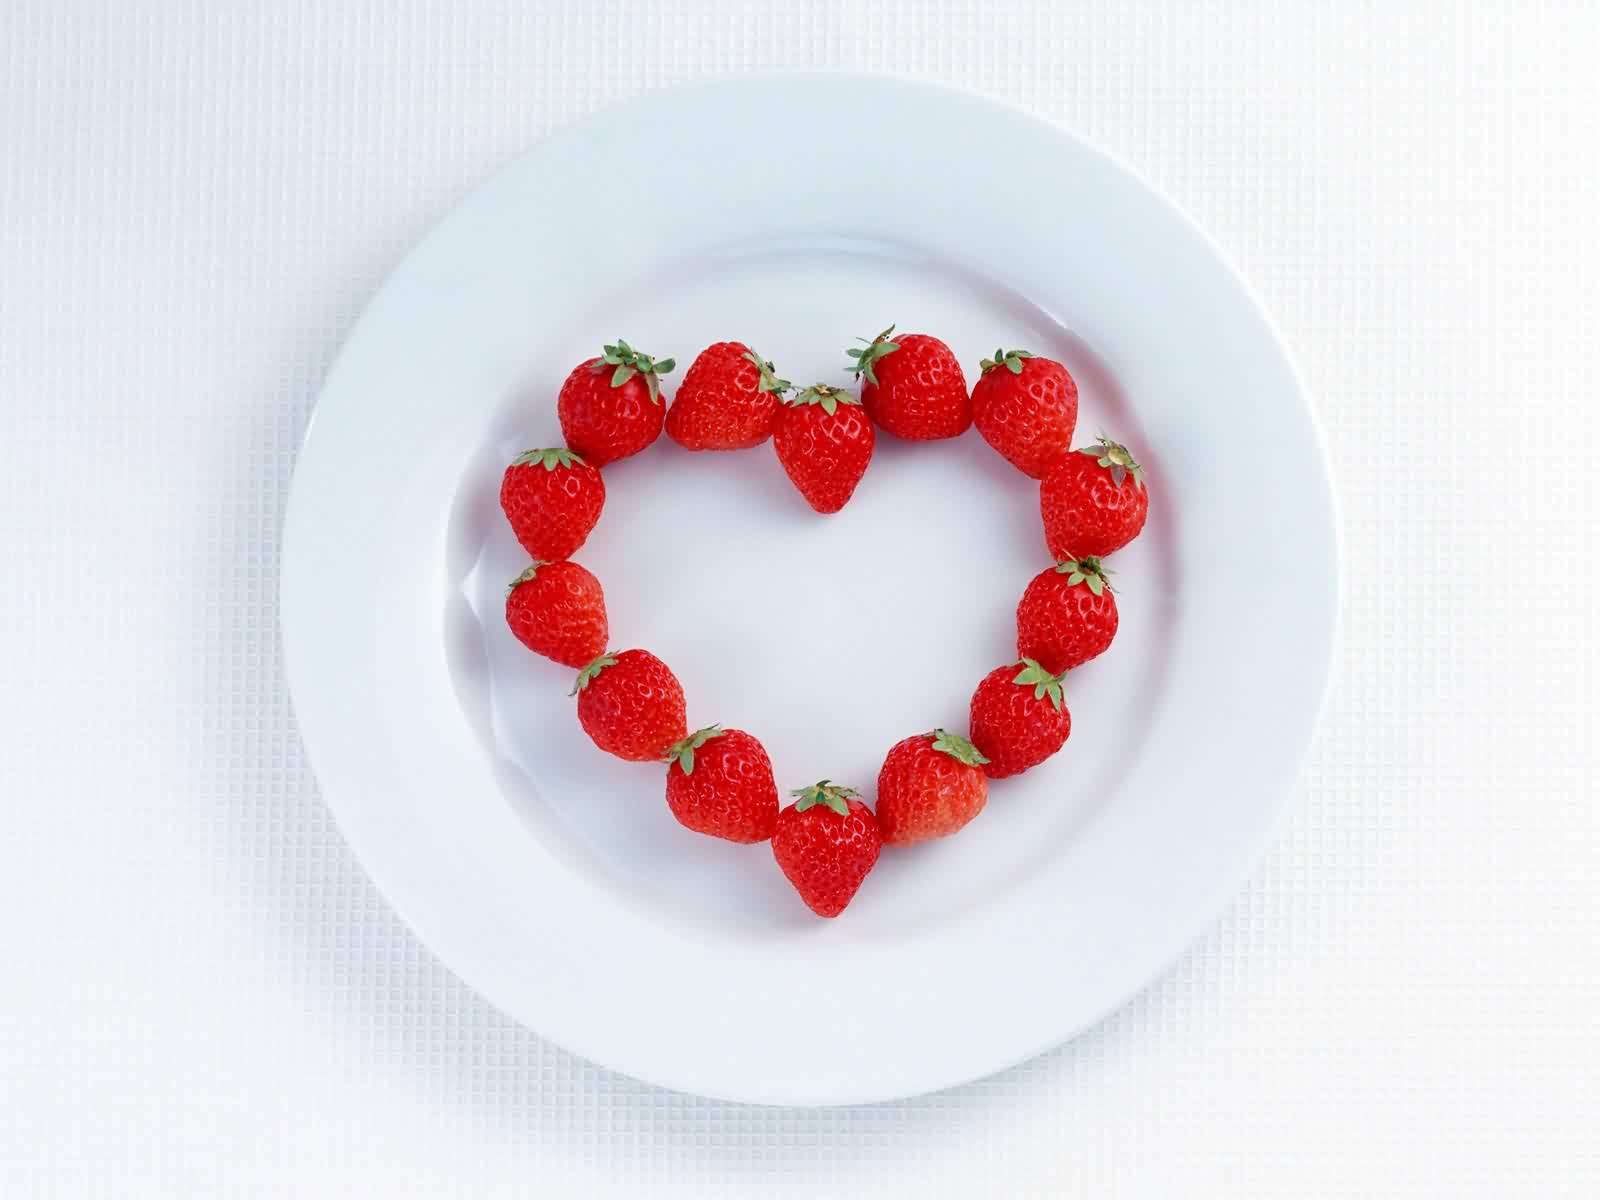 http://2.bp.blogspot.com/-fWCY-V_dpMY/Tehl84EfNyI/AAAAAAAABoc/Jo1WF_EYPFw/s1600/Love+wallpaper.jpg